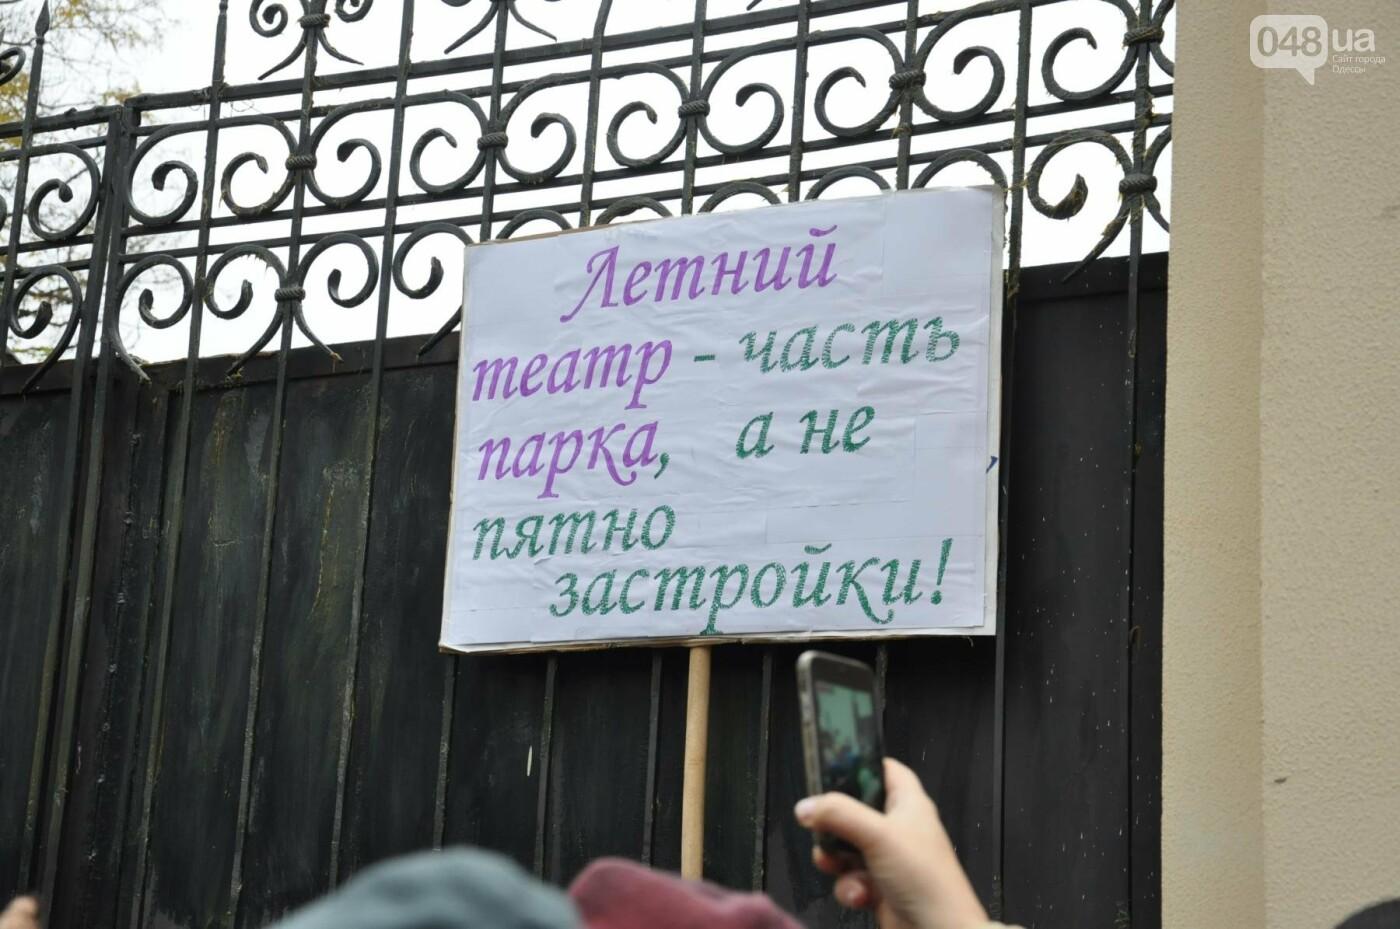 Около 5 сотен одесситов протестовали против застройки Горсада (ФОТО) , фото-11